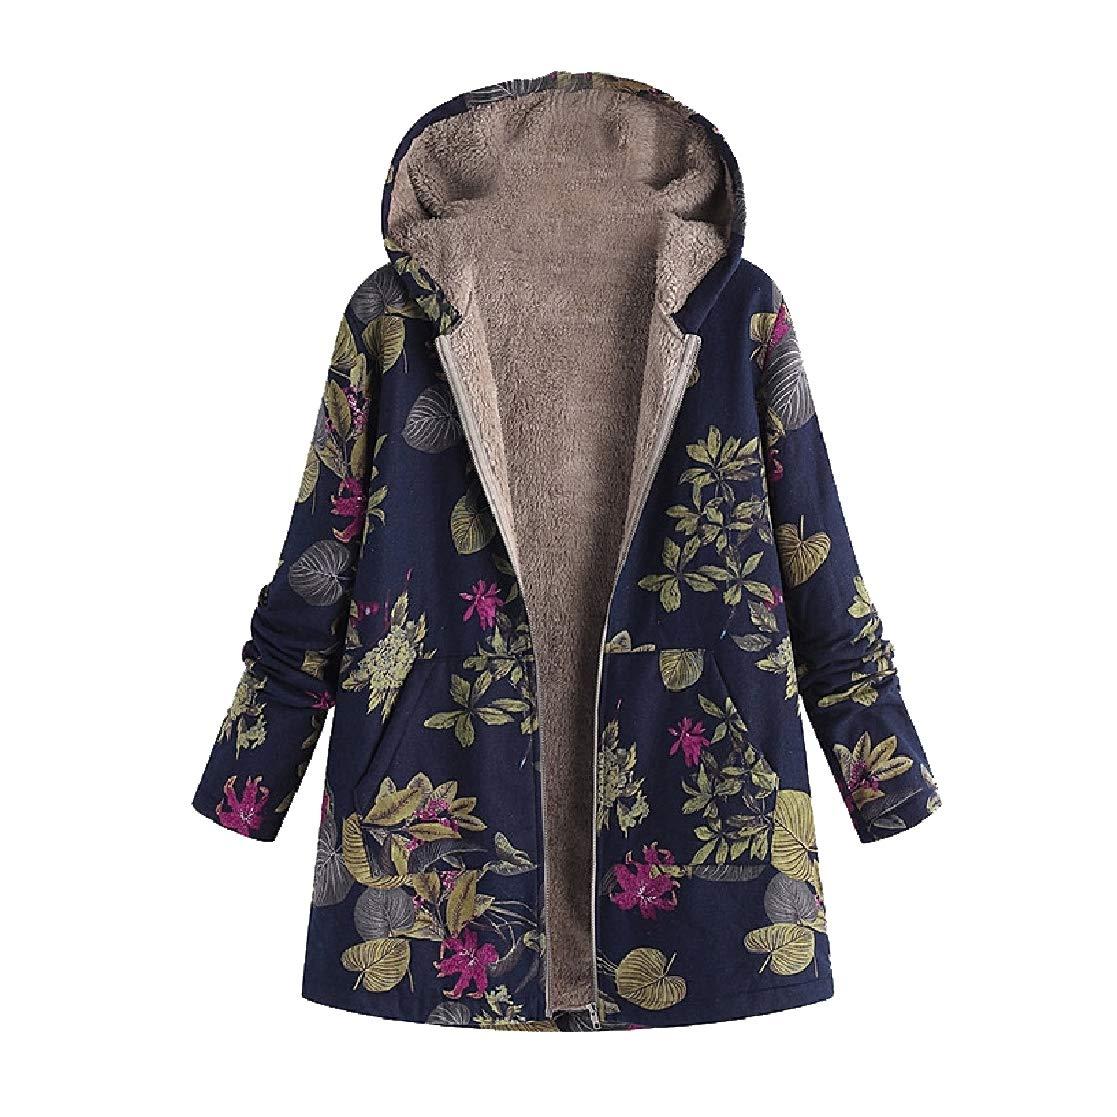 YUNY Women Baggy Floral Tribal with Hoodie Warm Linen Duffle Coat Dark Blue S